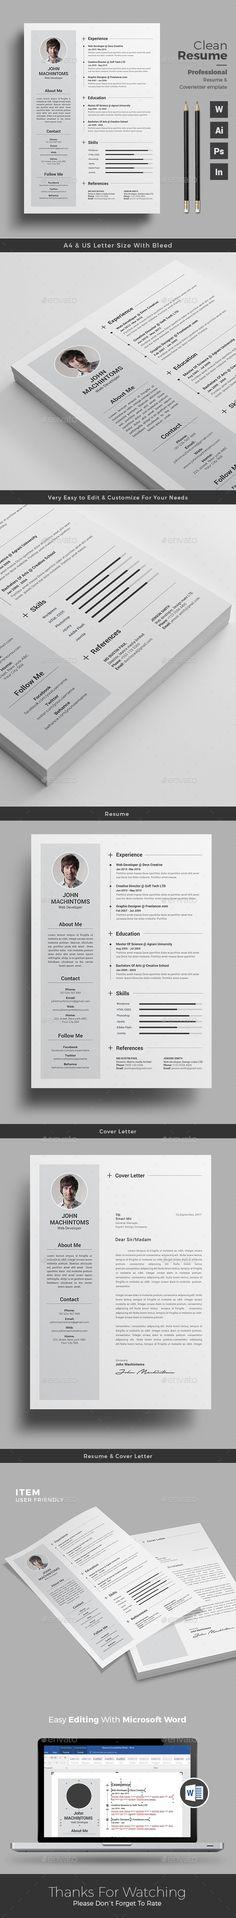 contoh cv format word free download template cv kreatif 30 desain - cover page template word free